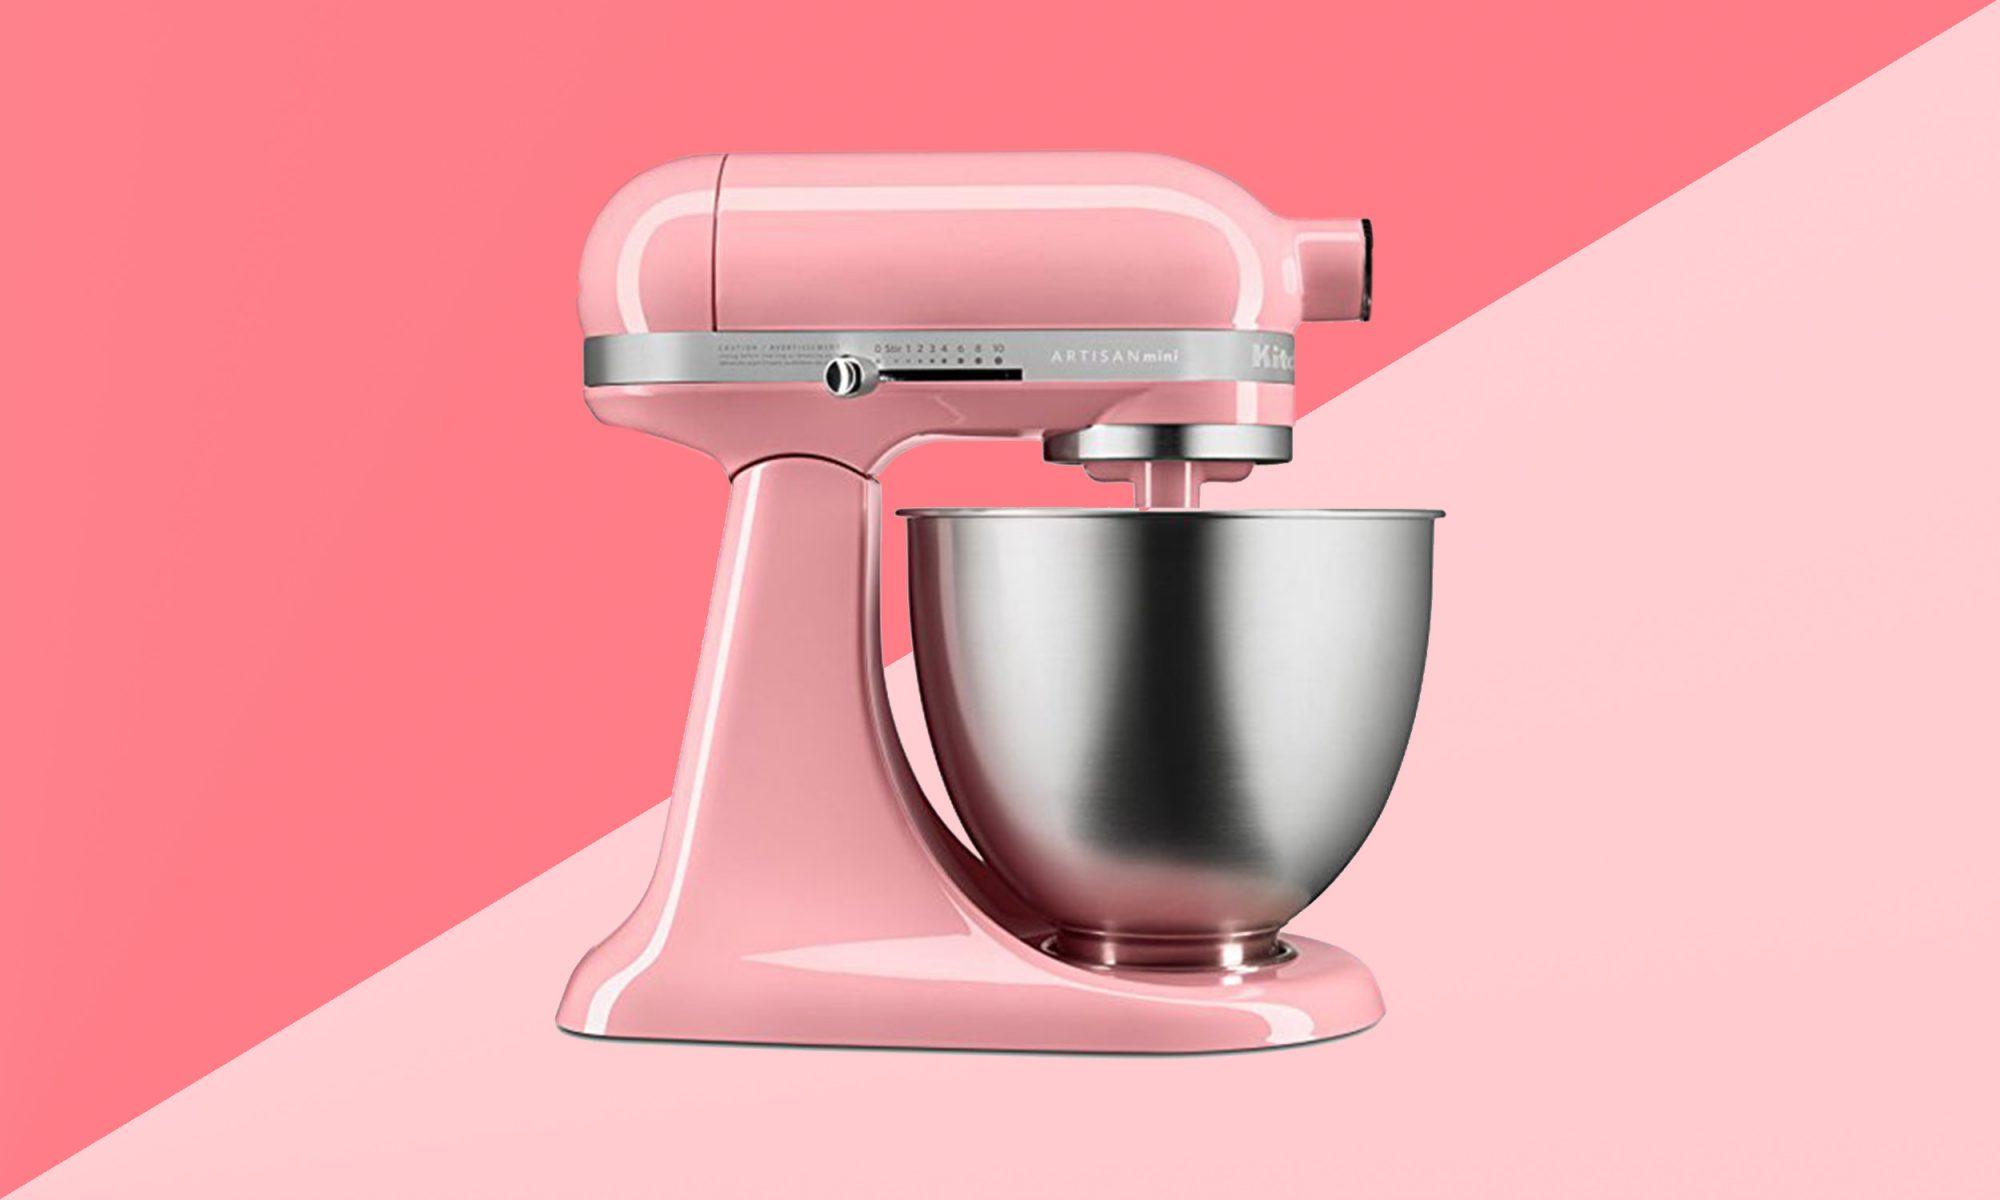 EC: Millennial Pink Kitchen Gear Will Make You an On-Trend Chef